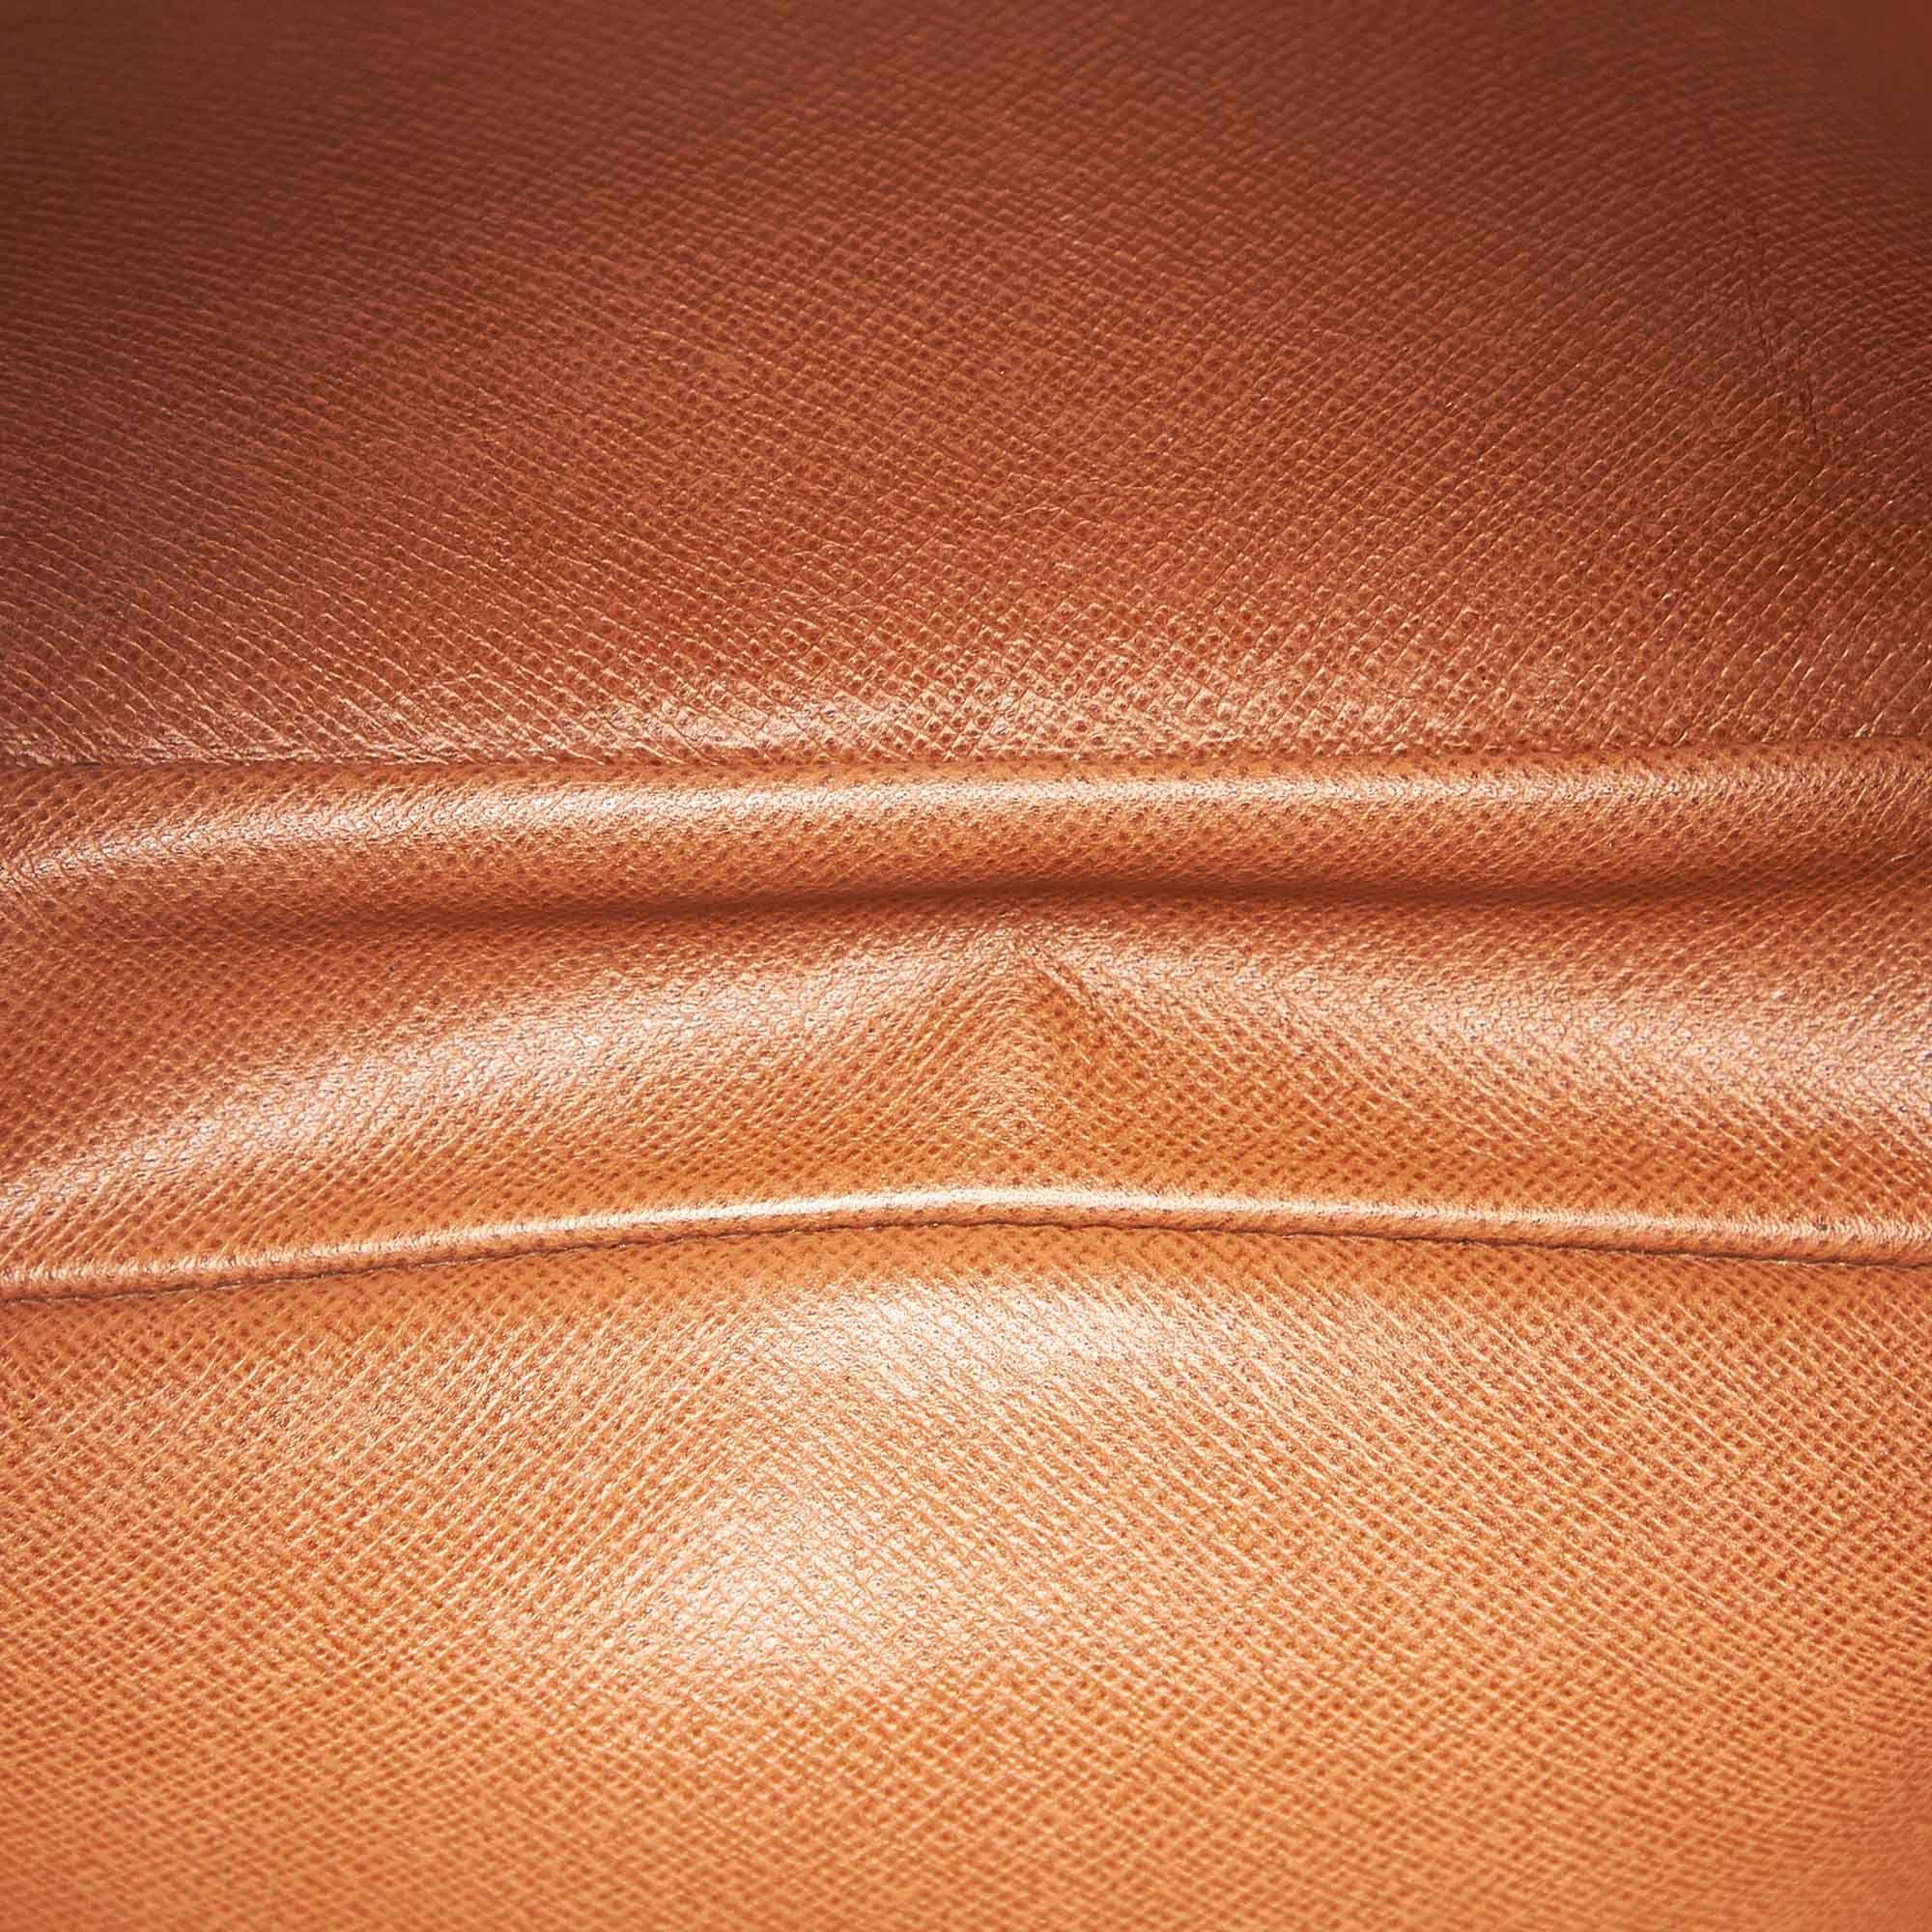 Vintage Louis Vuitton Monogram Marly Bandouliere Brown